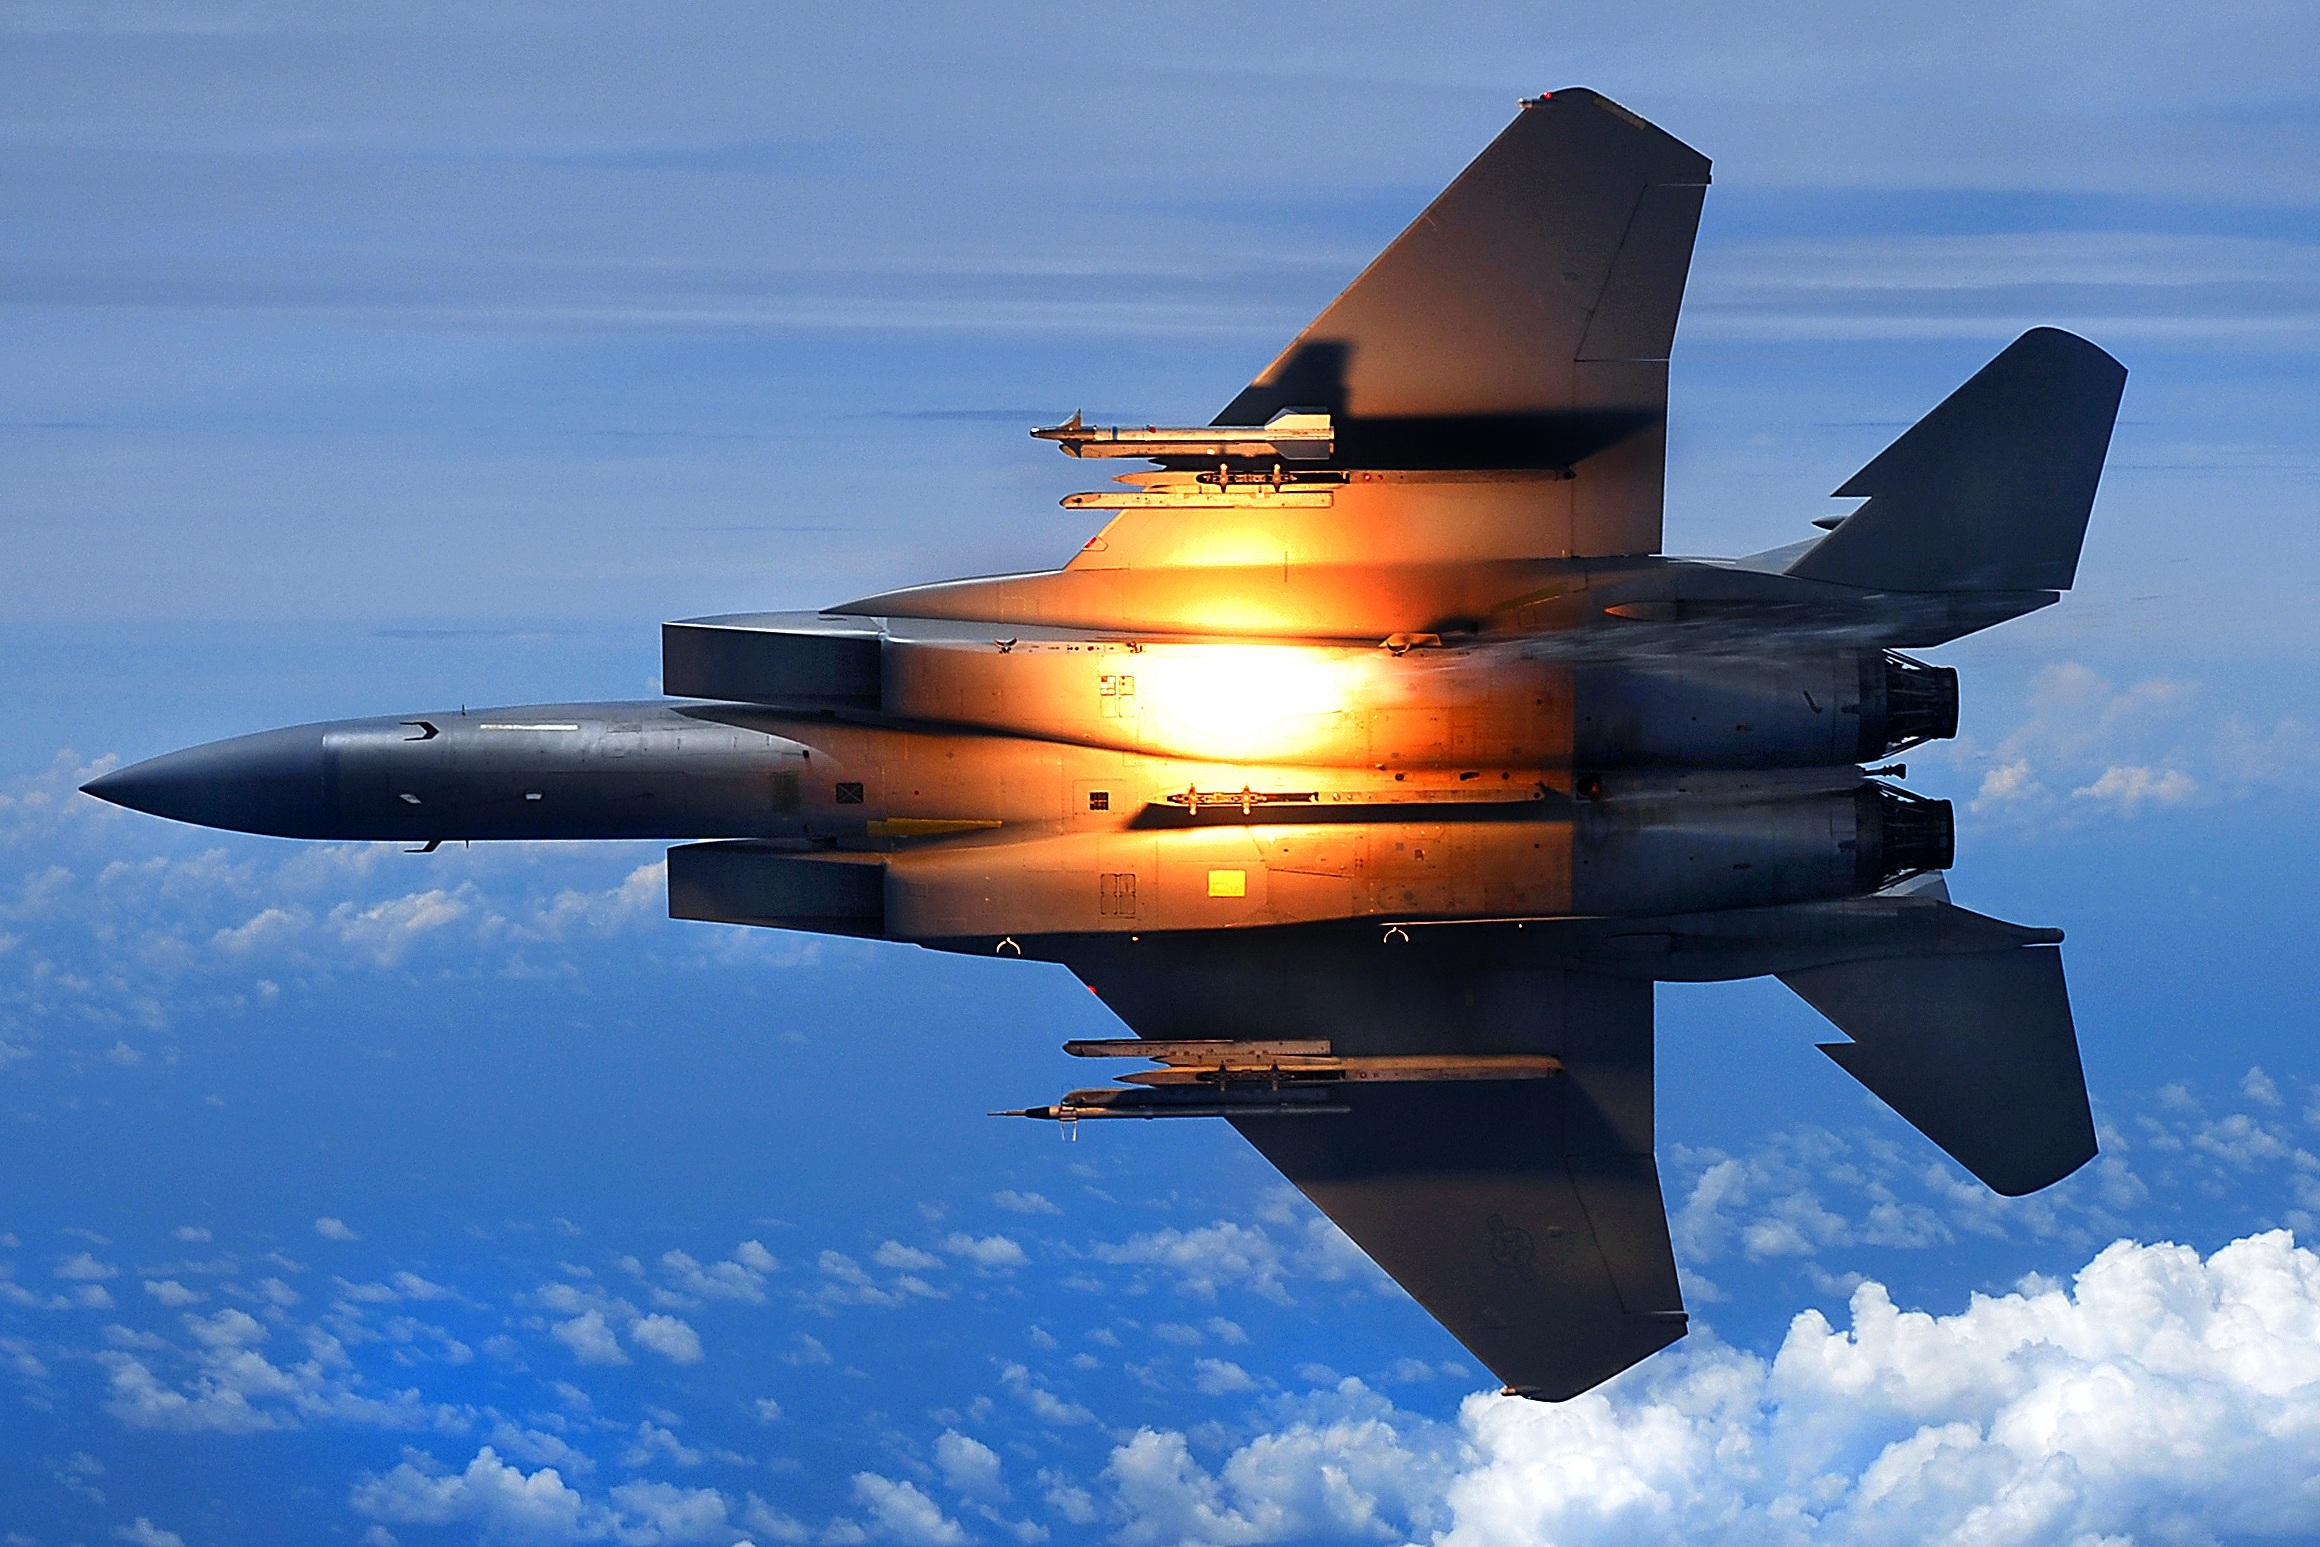 Aereo Da Caccia F 22 Raptor : Immagini belle ala aereo jet veicolo linea aerea